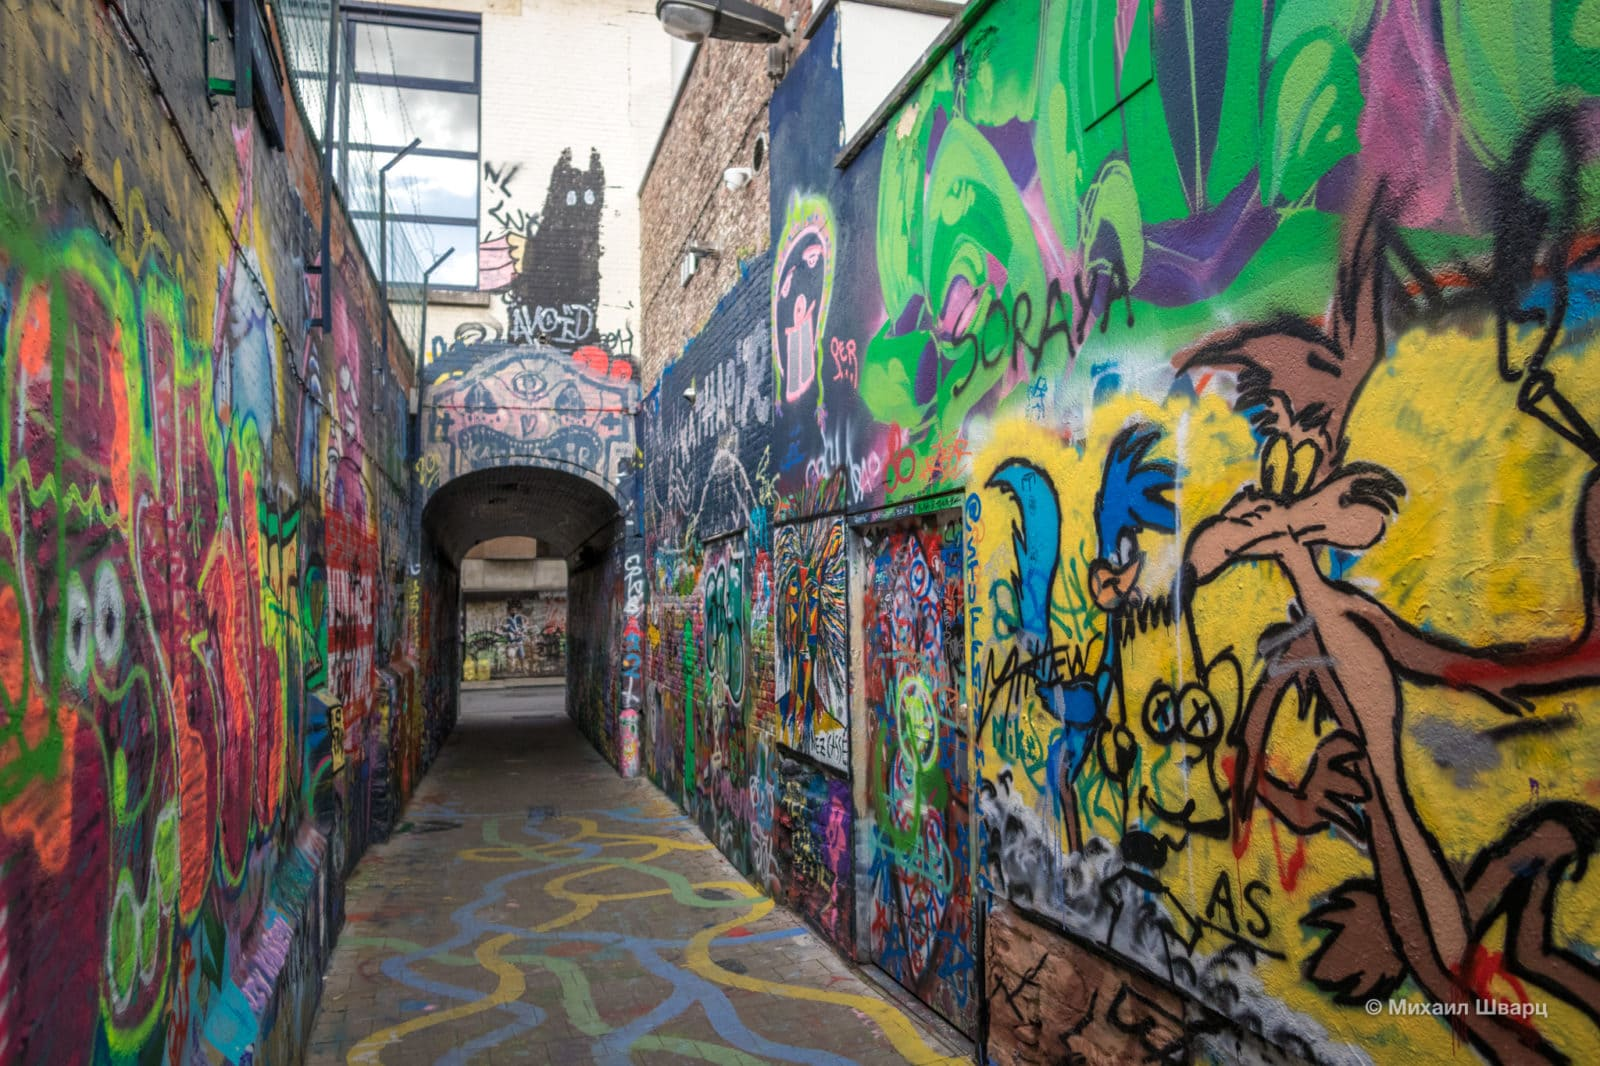 Открытая зона для граффити Graffiti Street